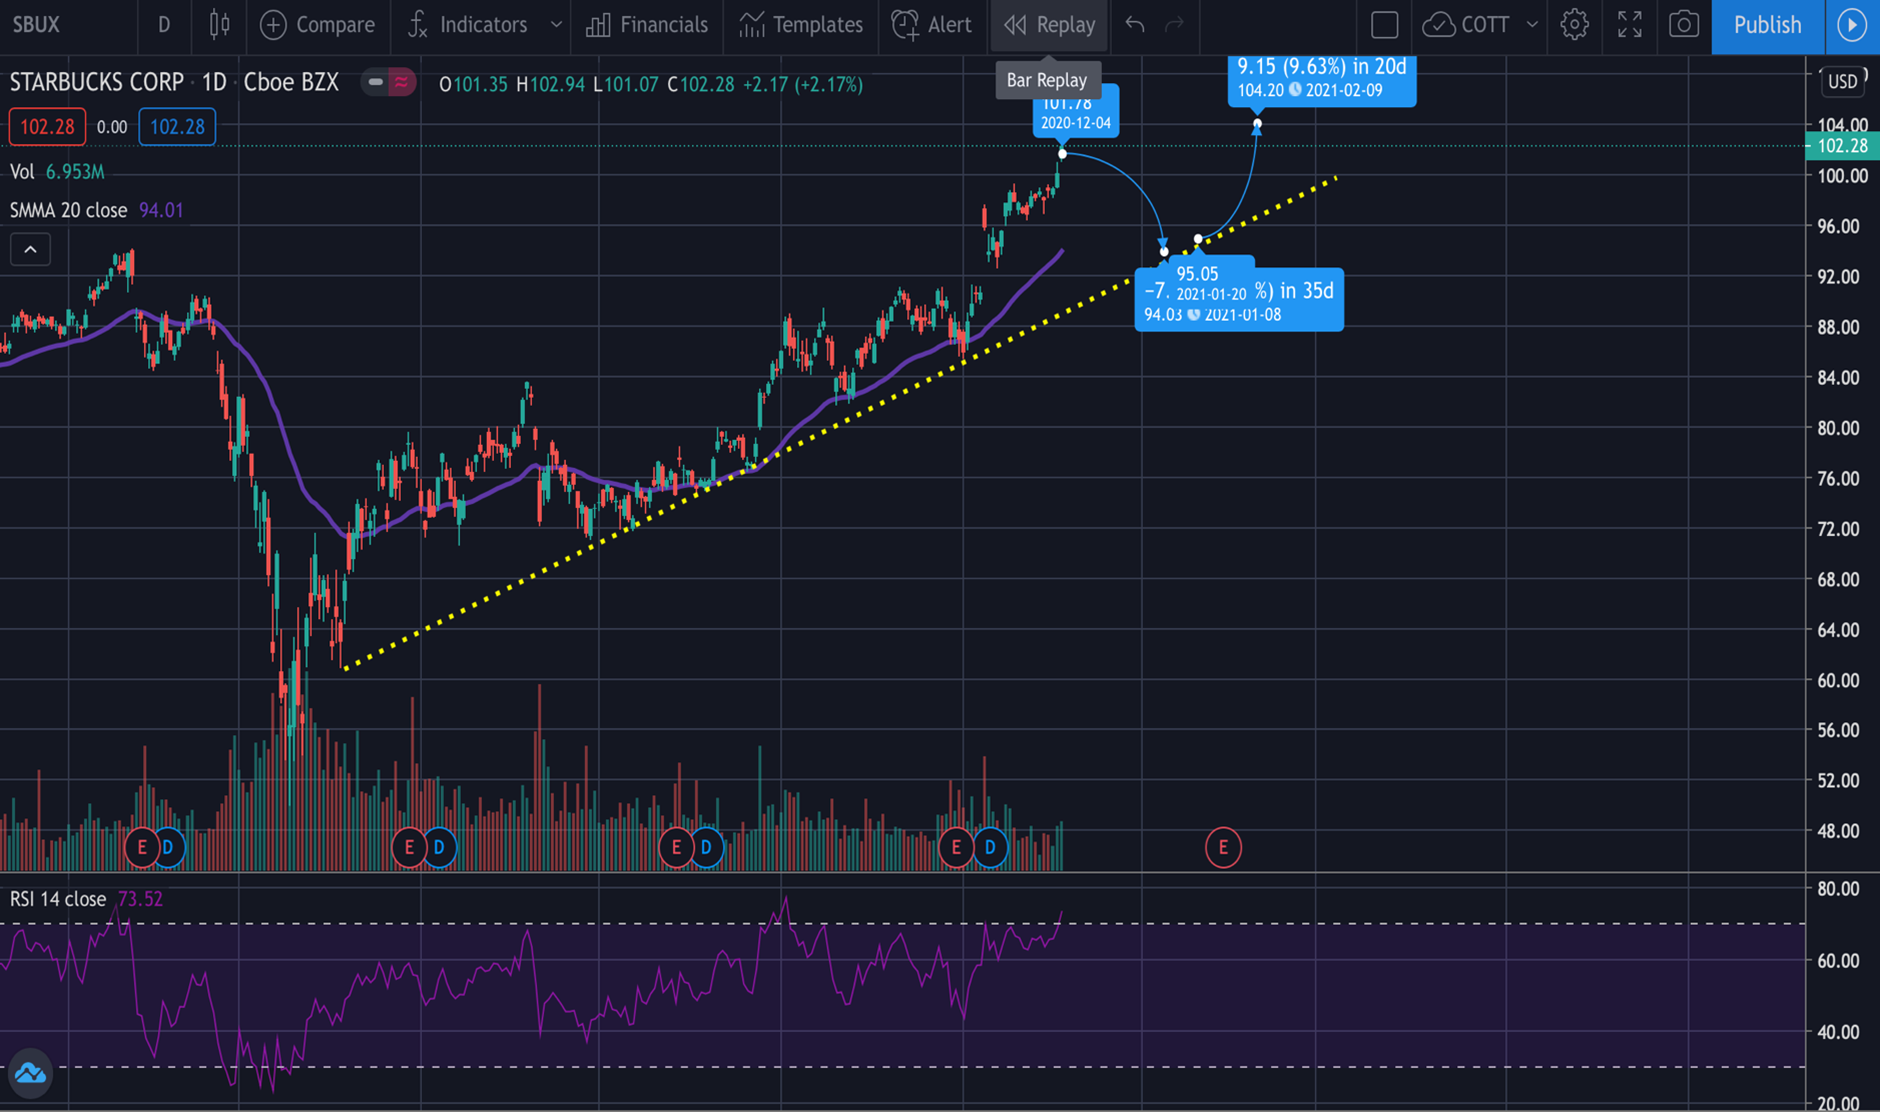 STARBUCKS STOCK PRICE SBUX TECHNICALS CHART